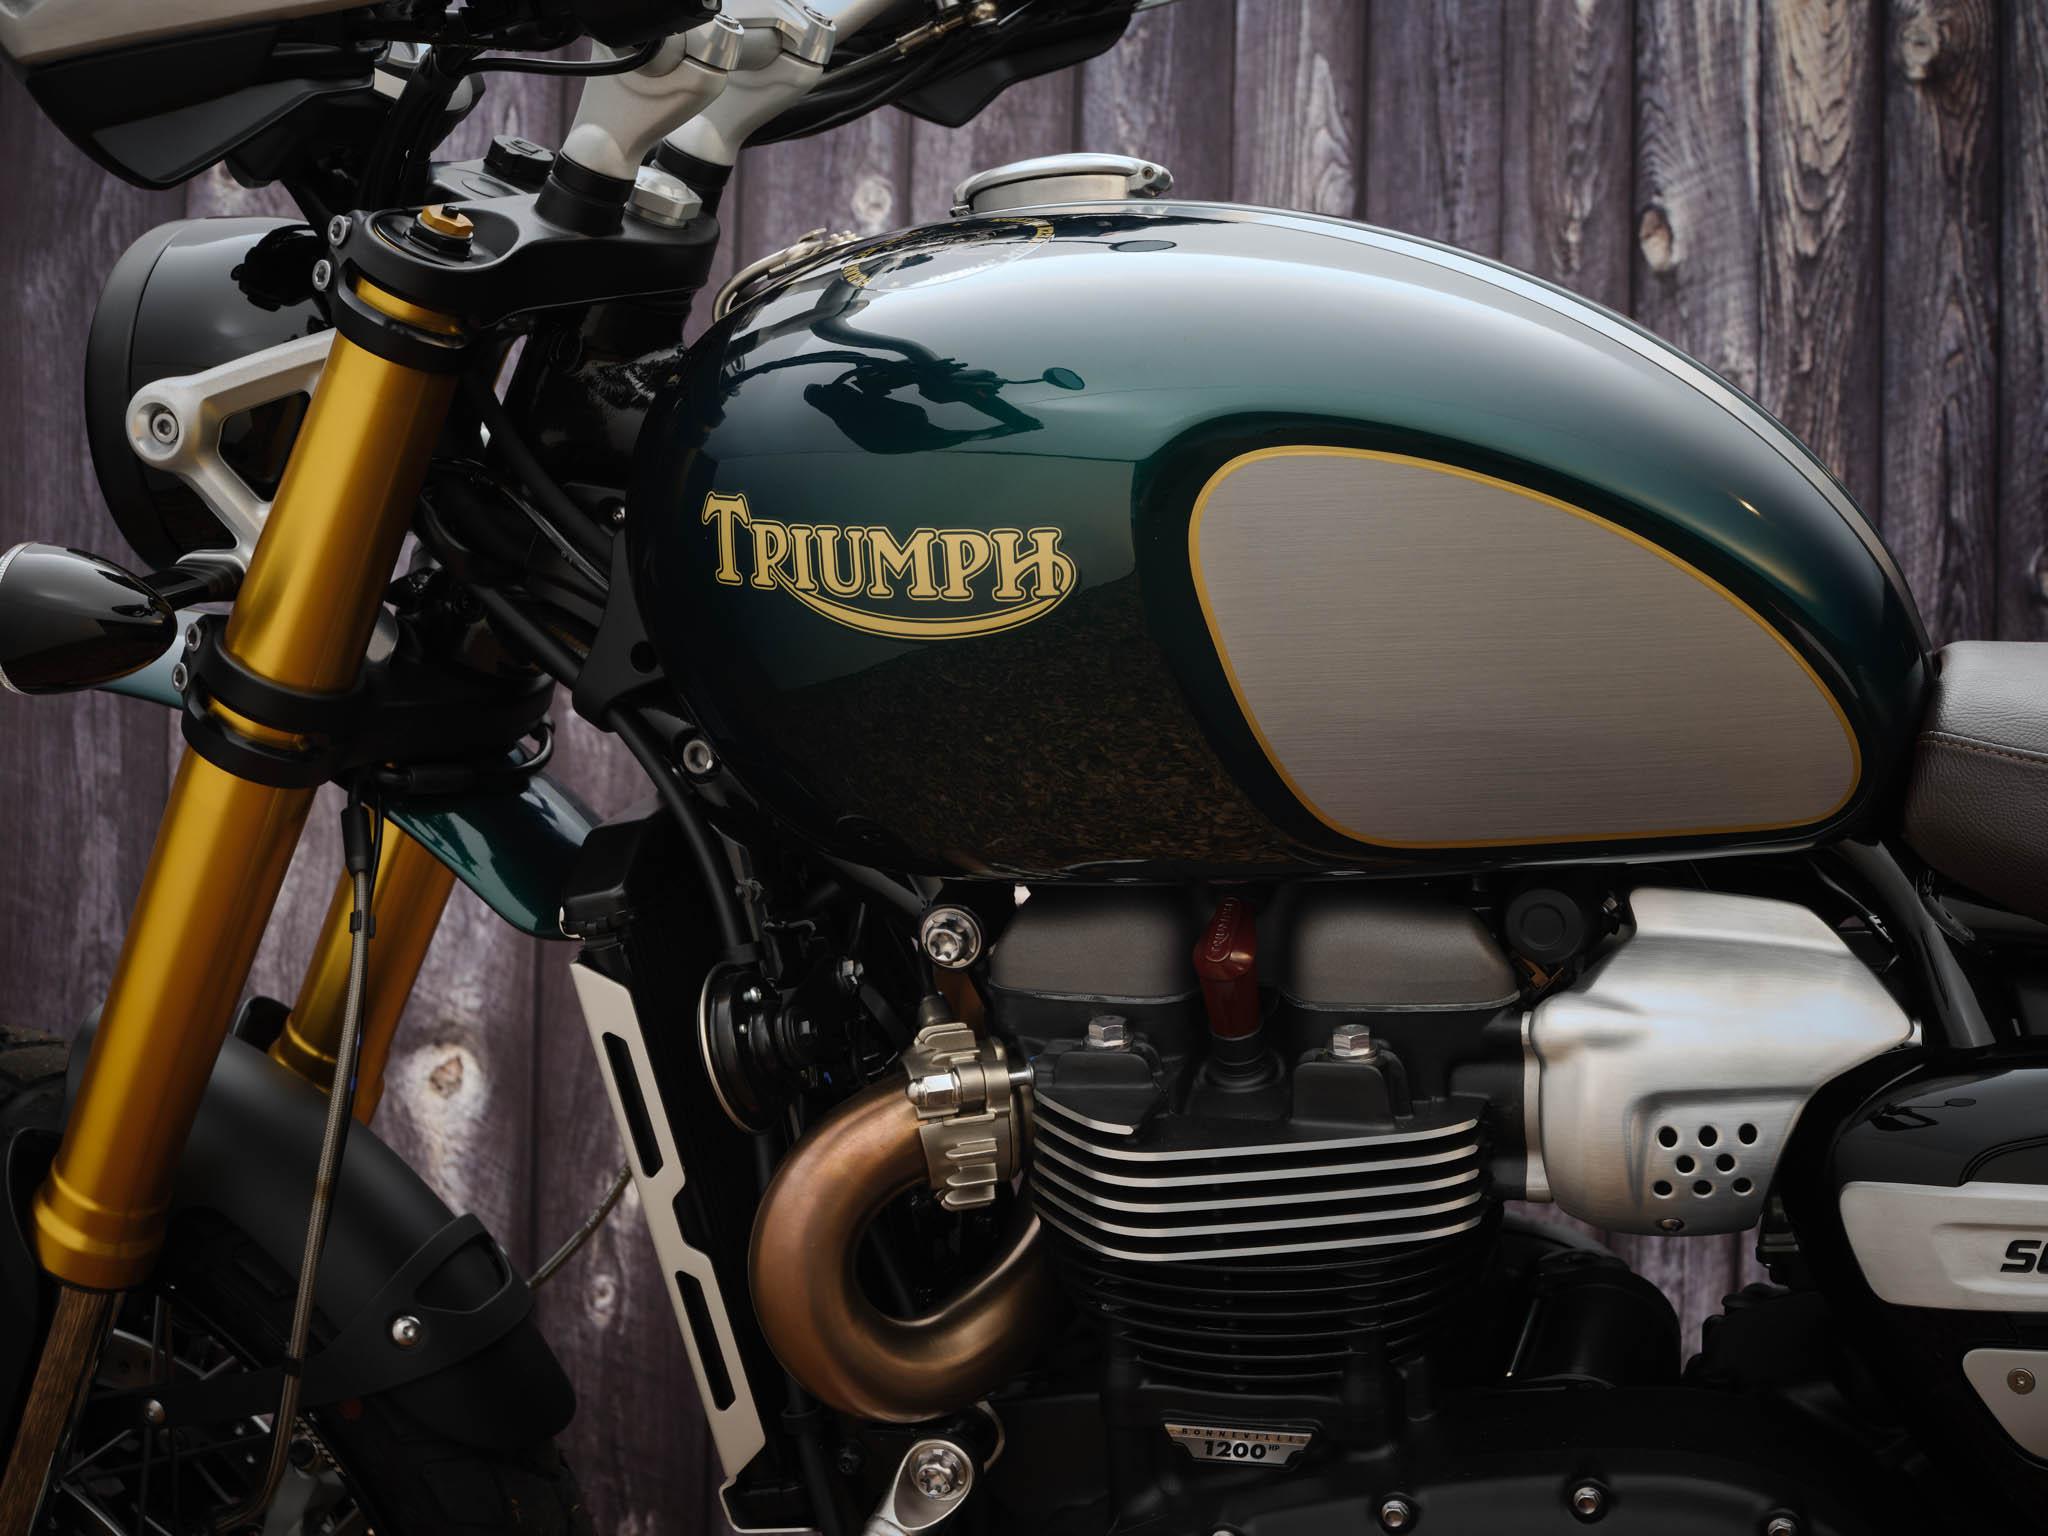 Triumph_Scrambler_1200_Steve_McQueen_Details_2021-2